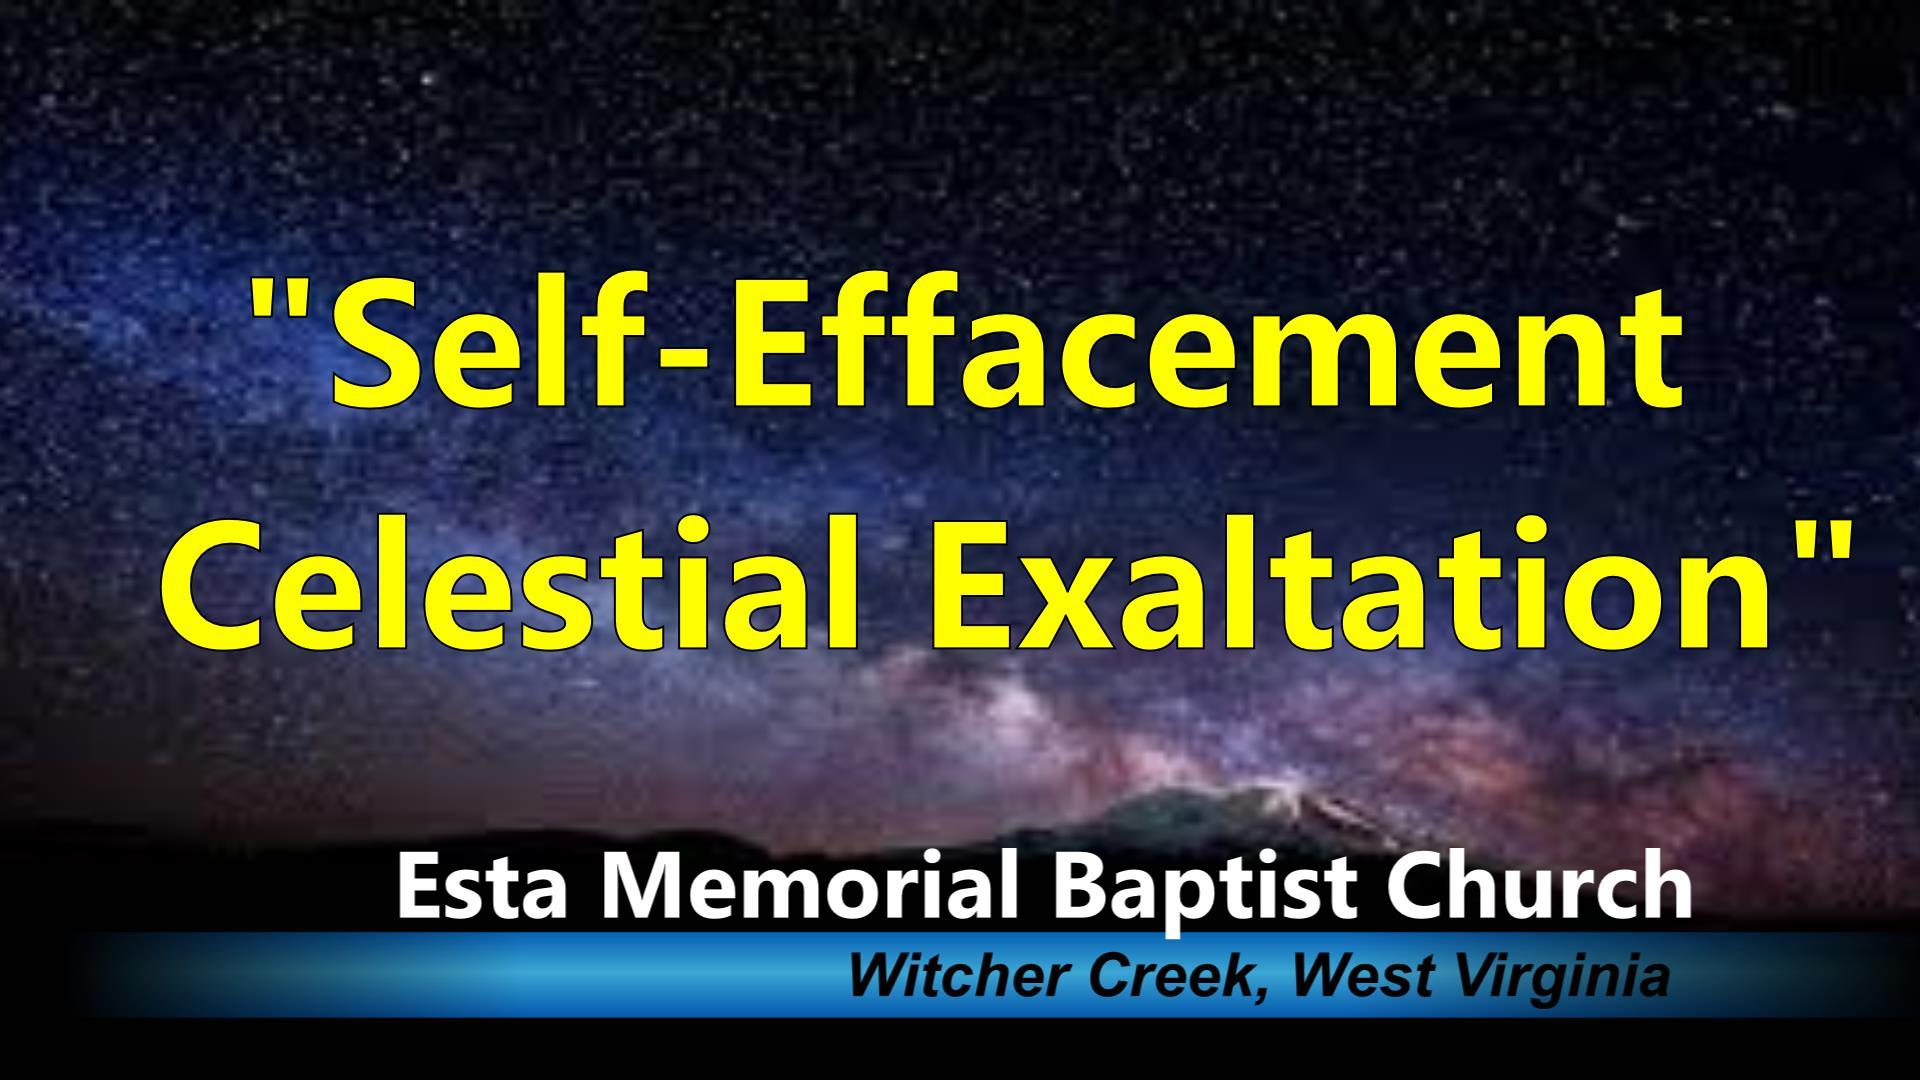 SELF EFFACEMENT CELESTIAL EXALTATION